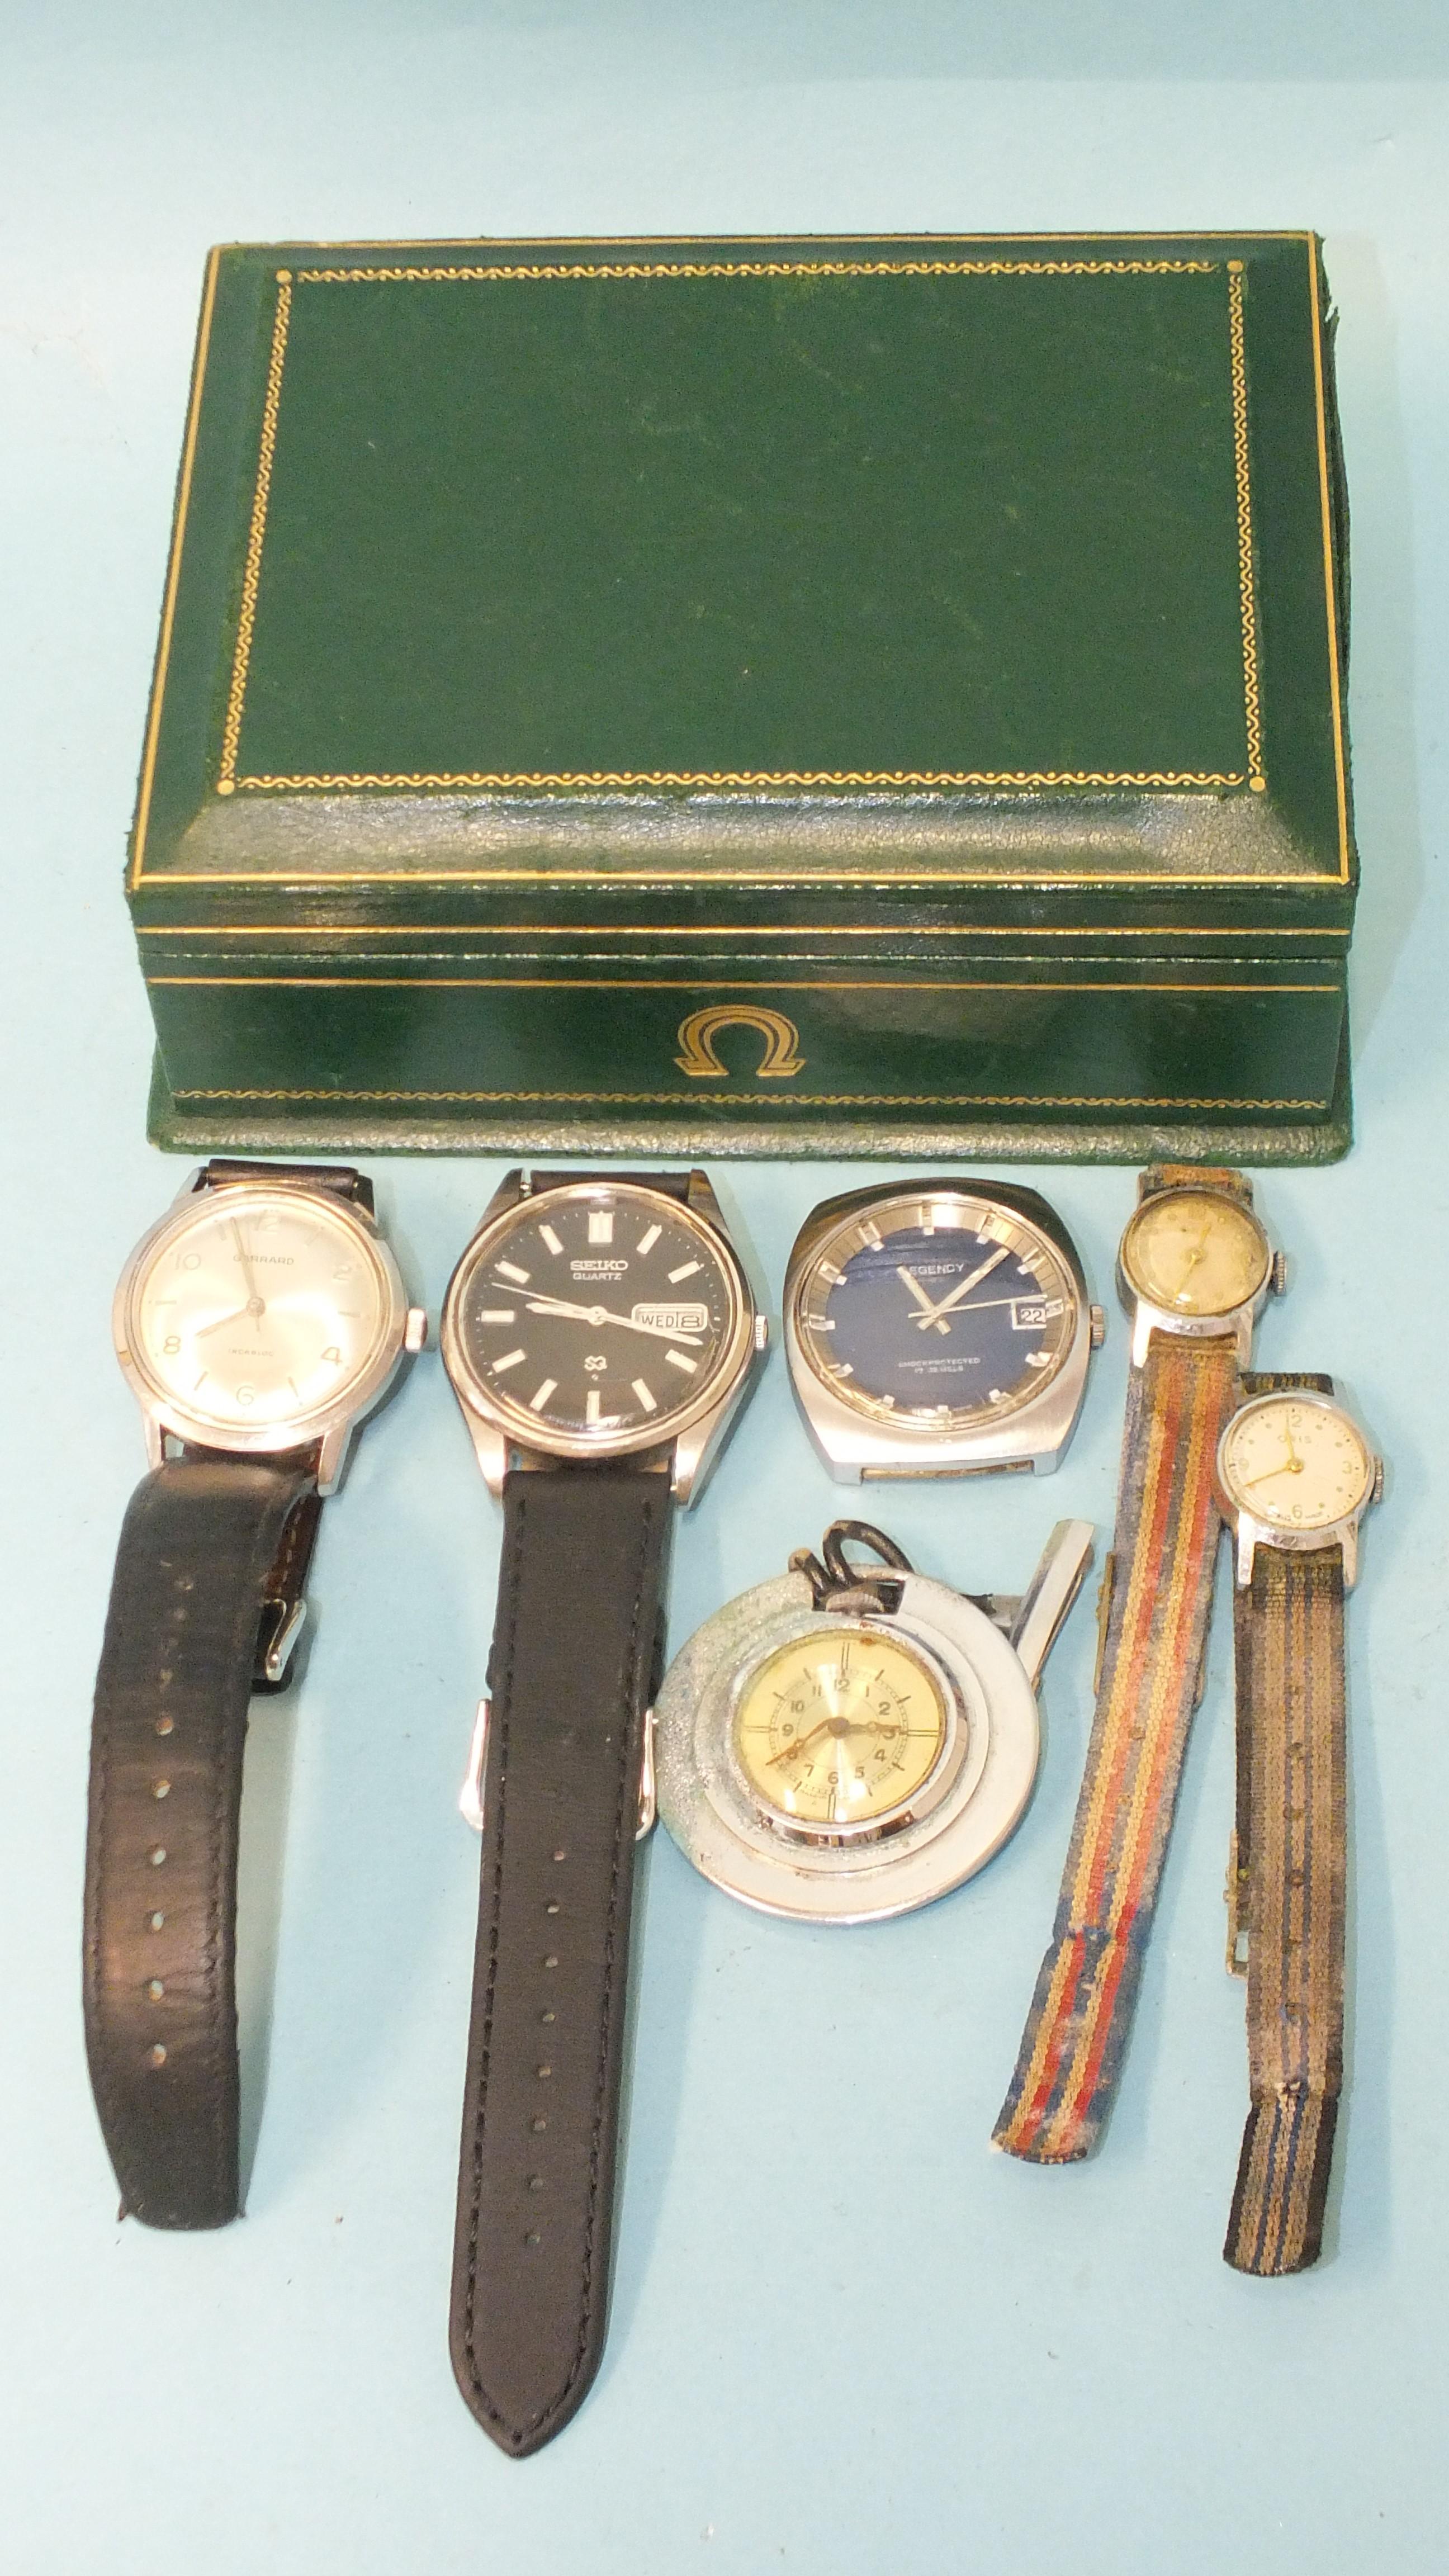 Garrard, a gentleman's Garrard Incabloc steel-cased wrist watch and other watches, in an Omega